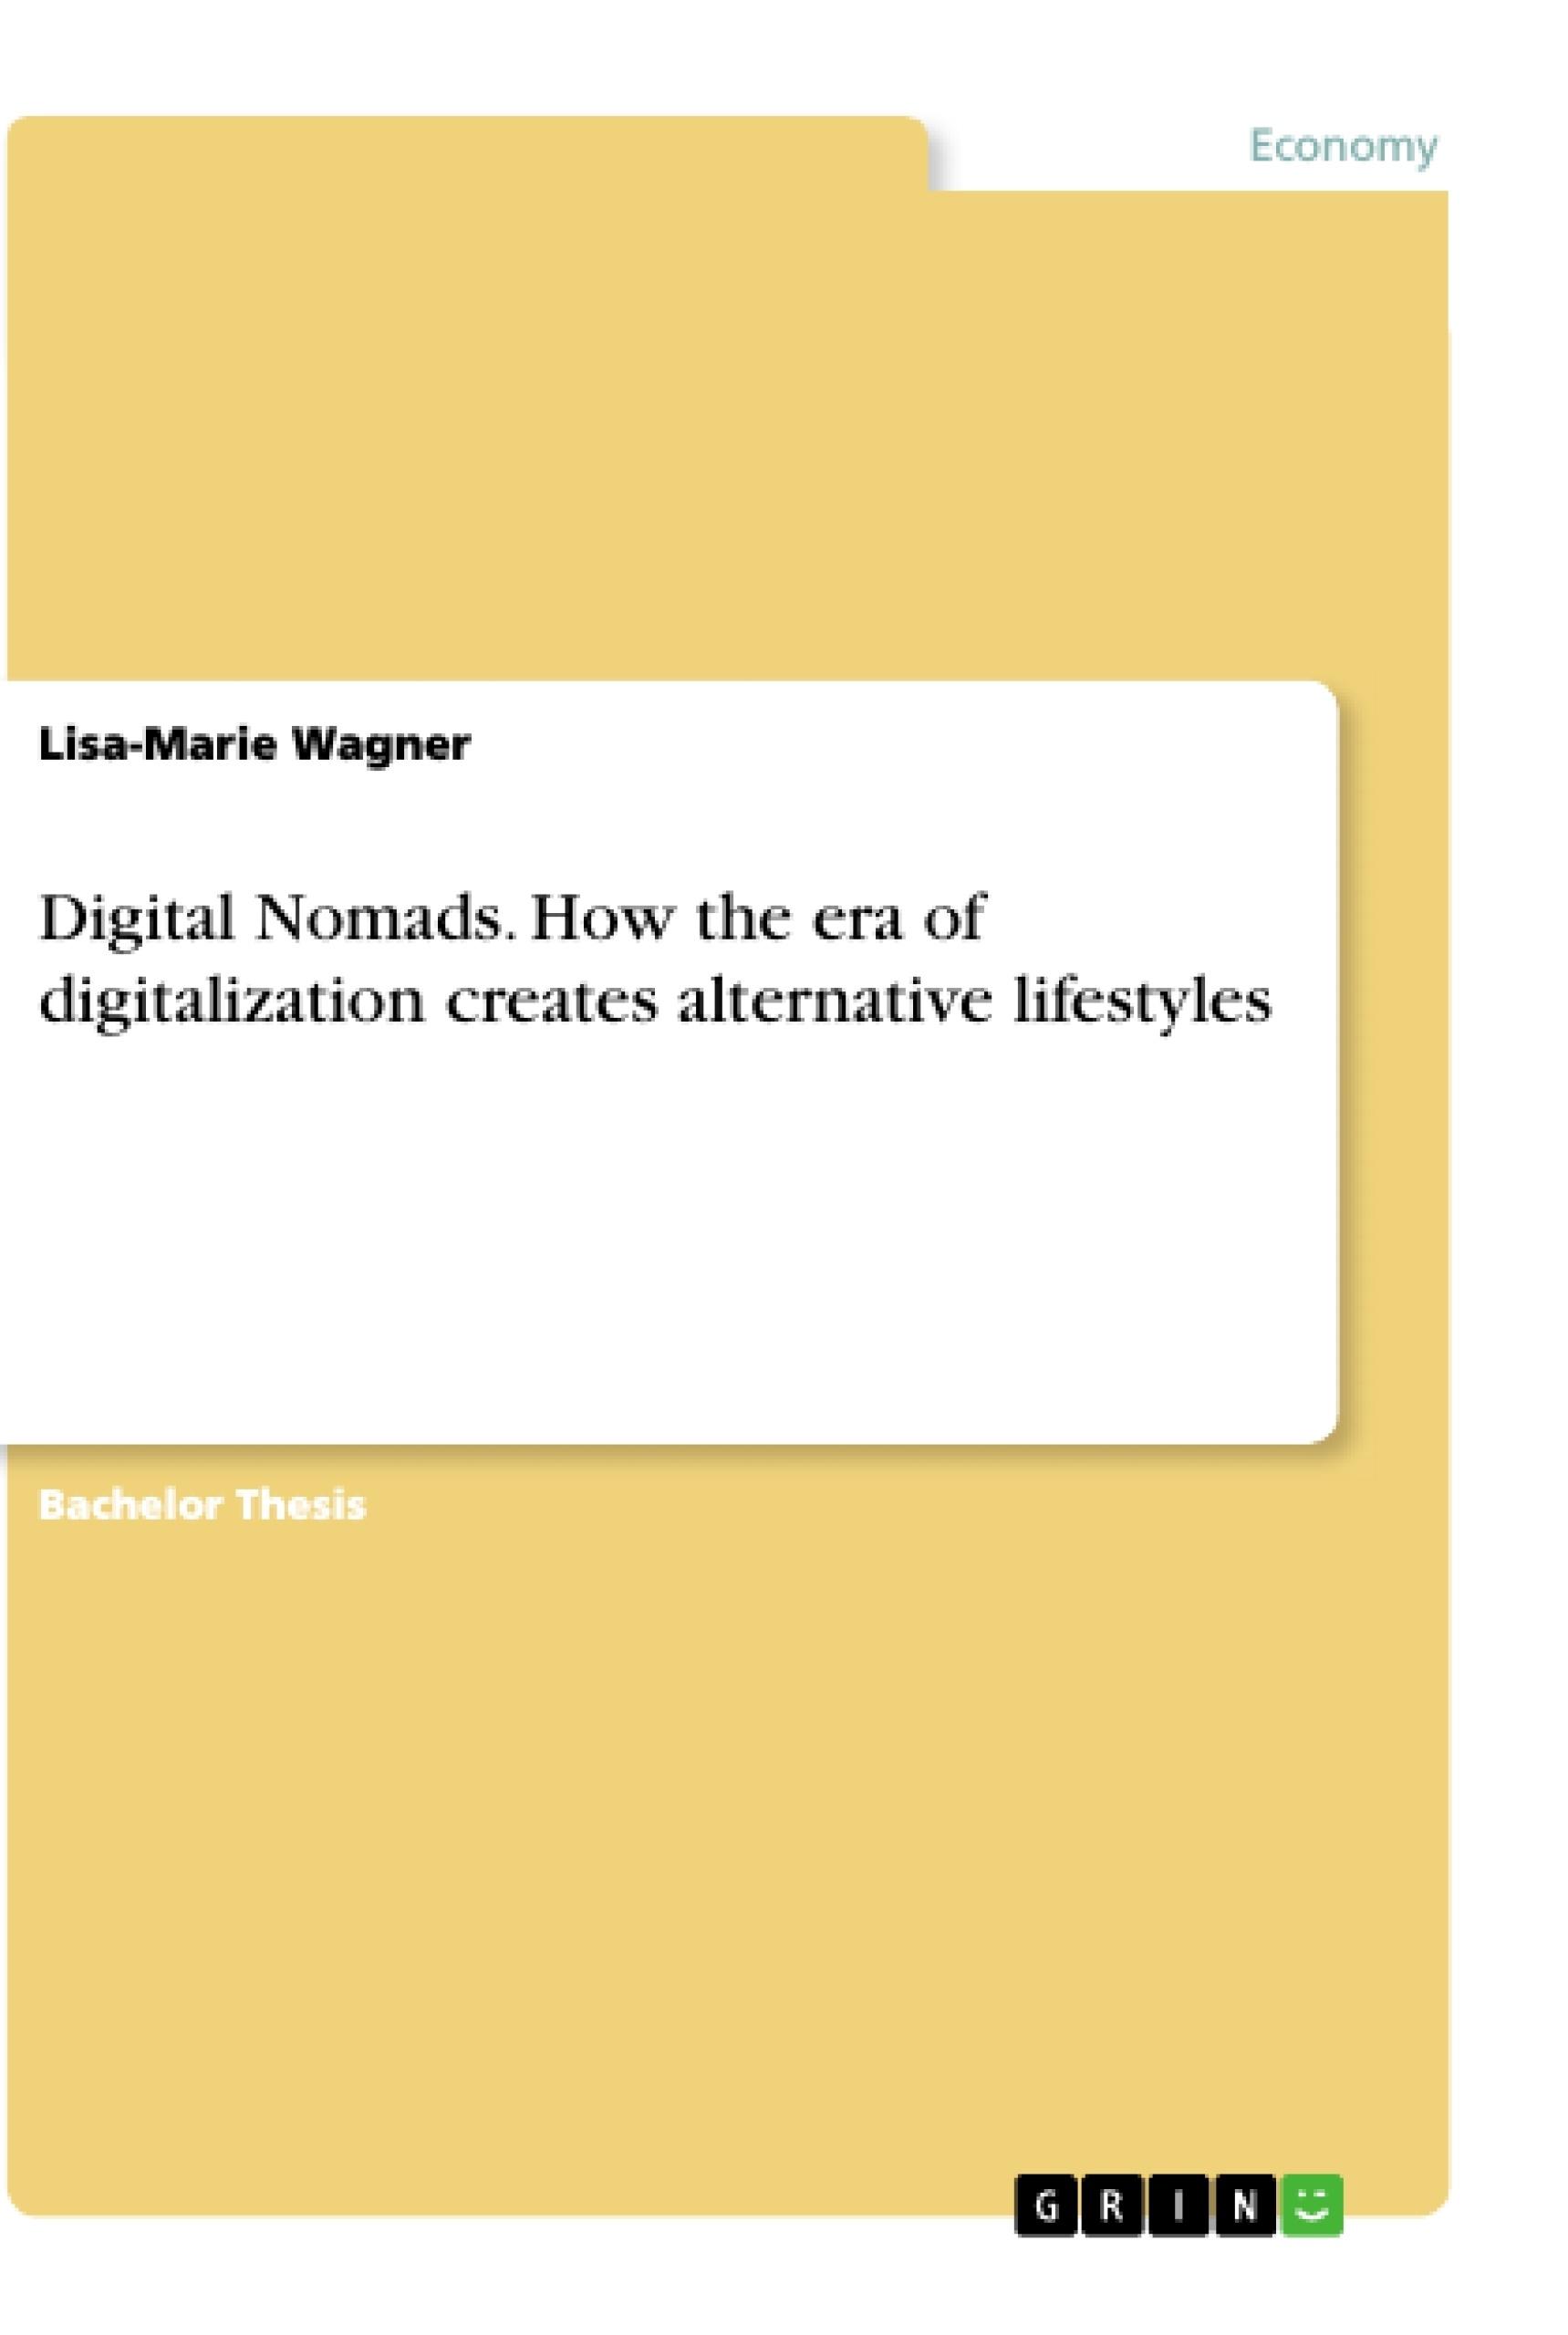 Title: Digital Nomads. How the era of digitalization creates alternative lifestyles